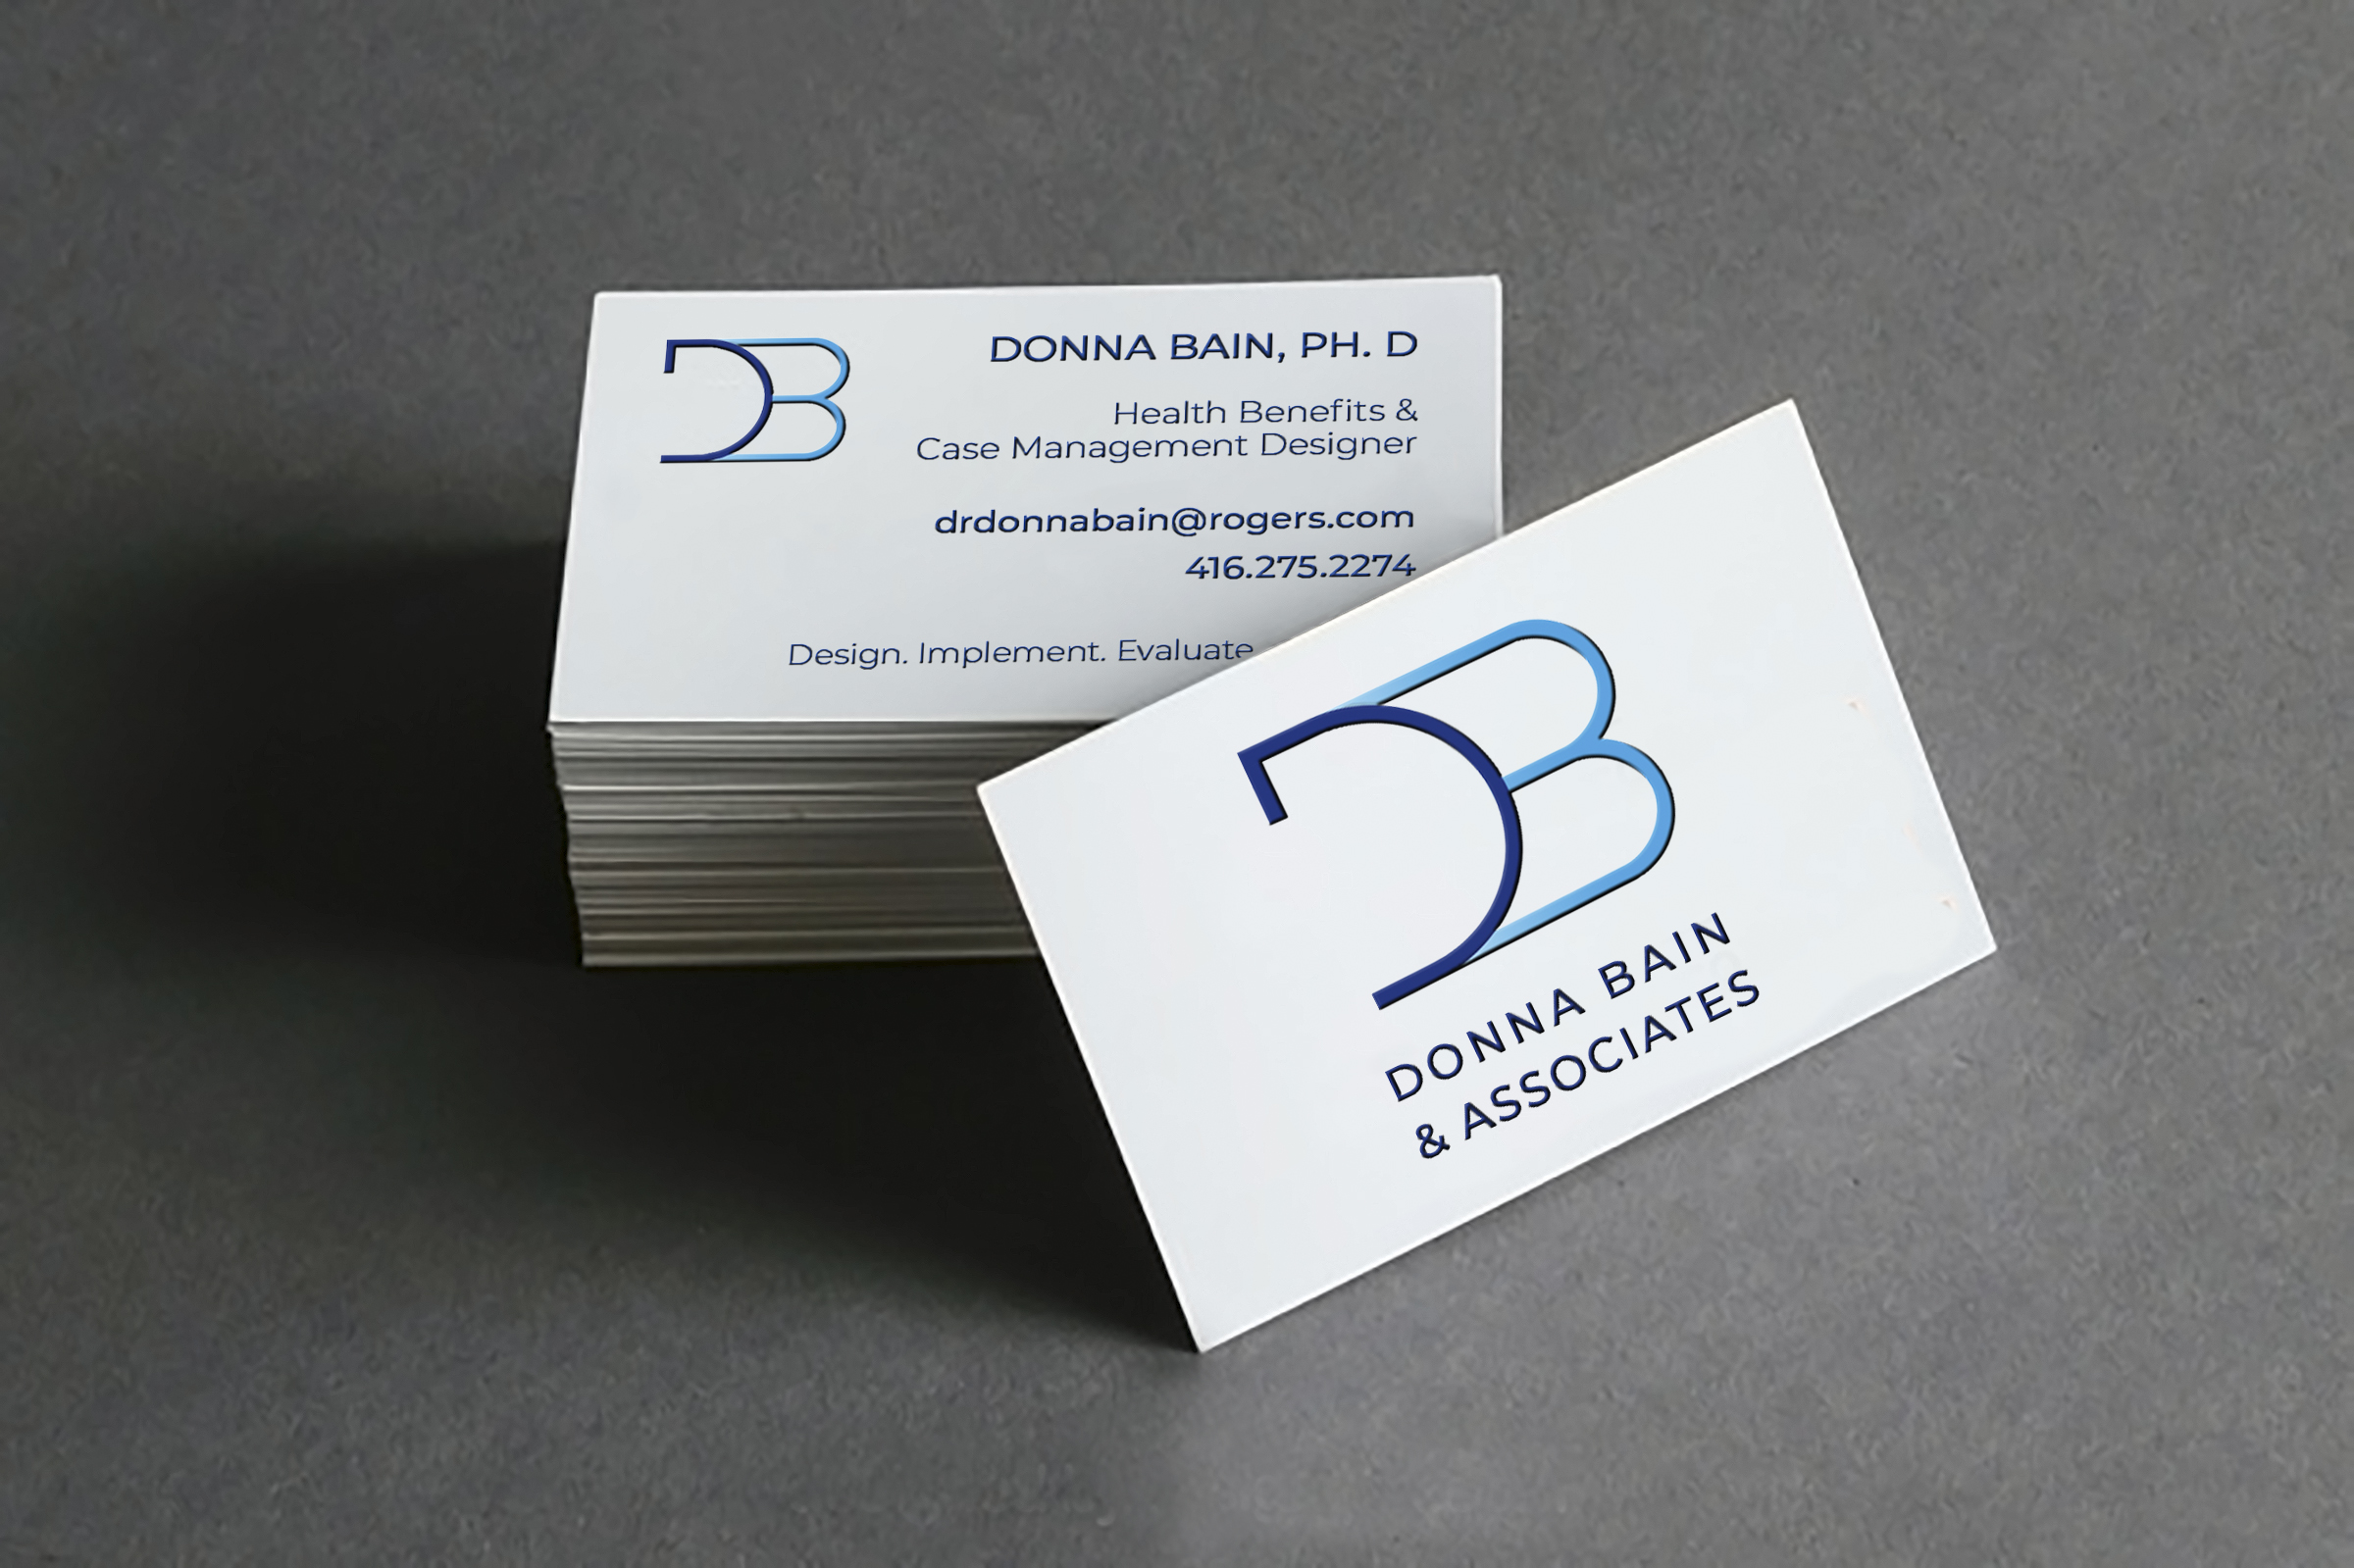 DBbusinesscard.jpg